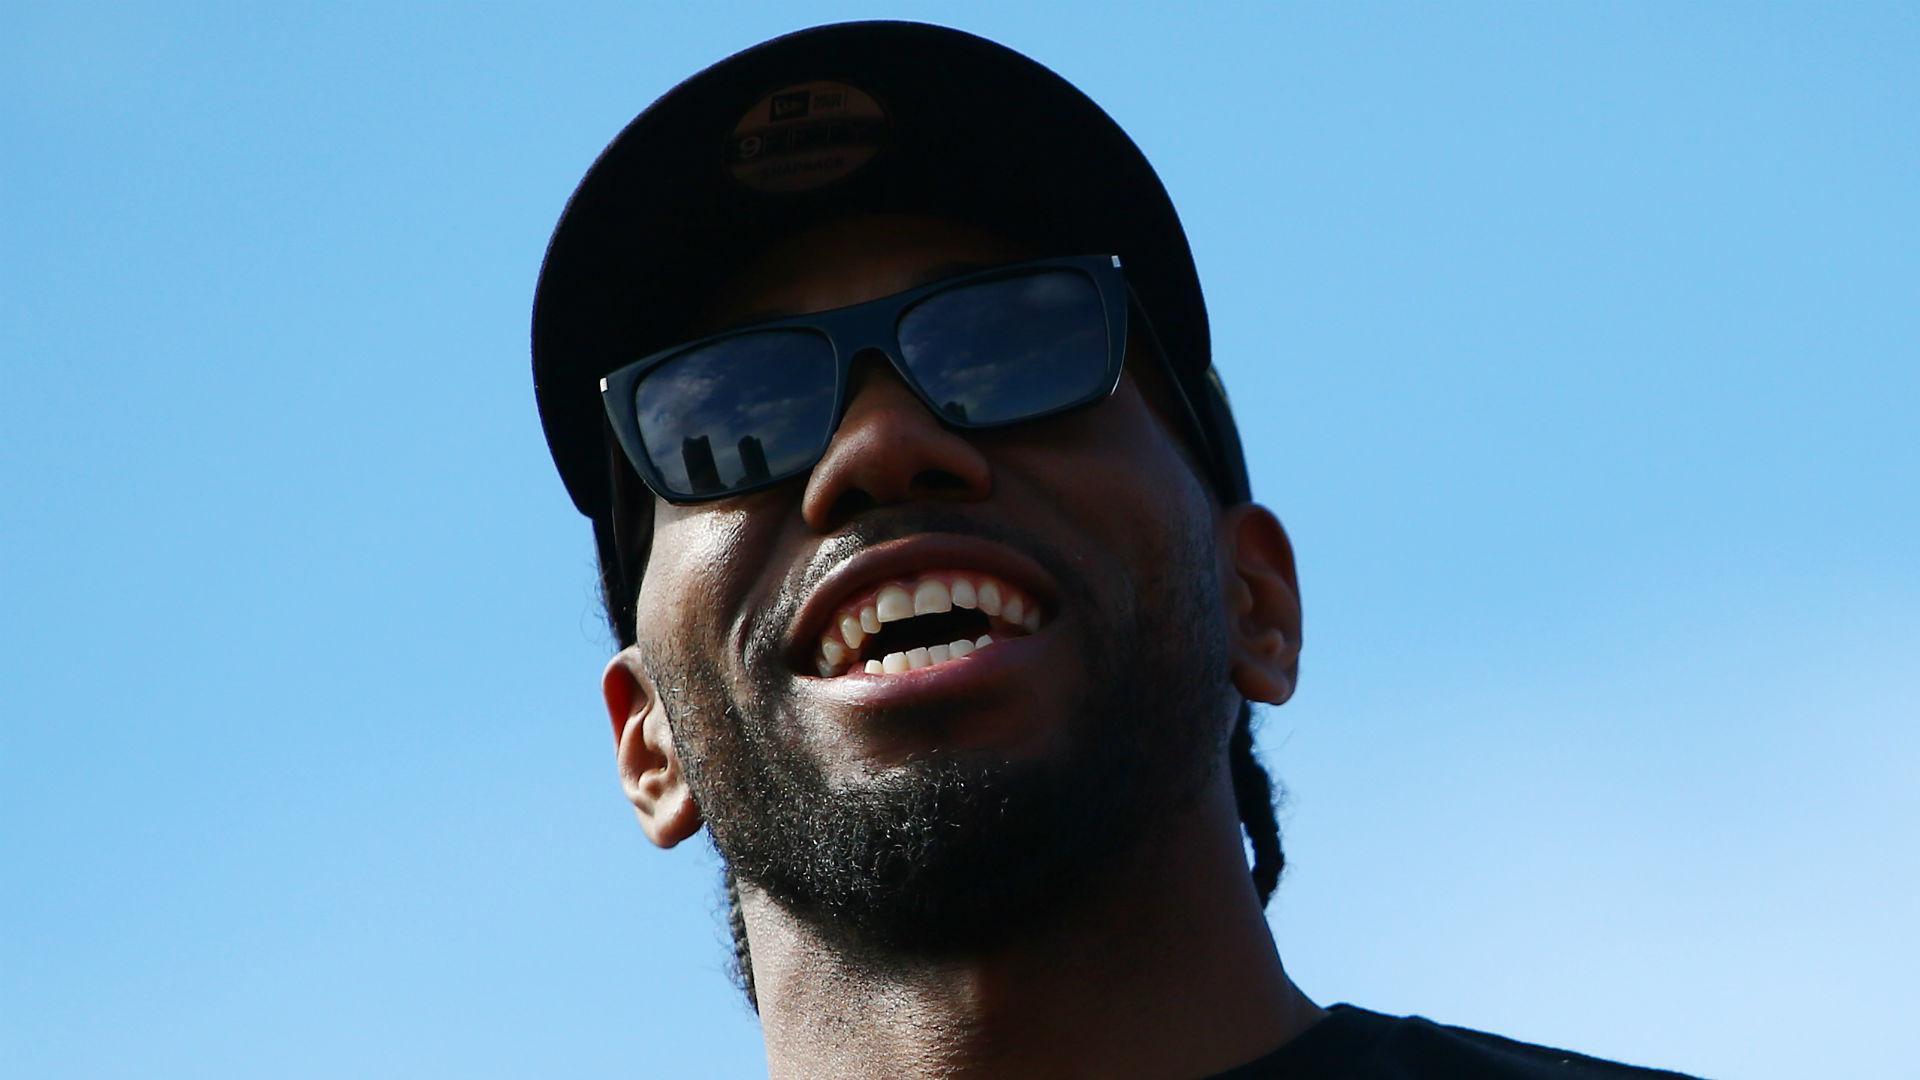 Toronto Raptors star Kawhi Leonard mimicked his laughter at the NBA champions' title parade on Monday.